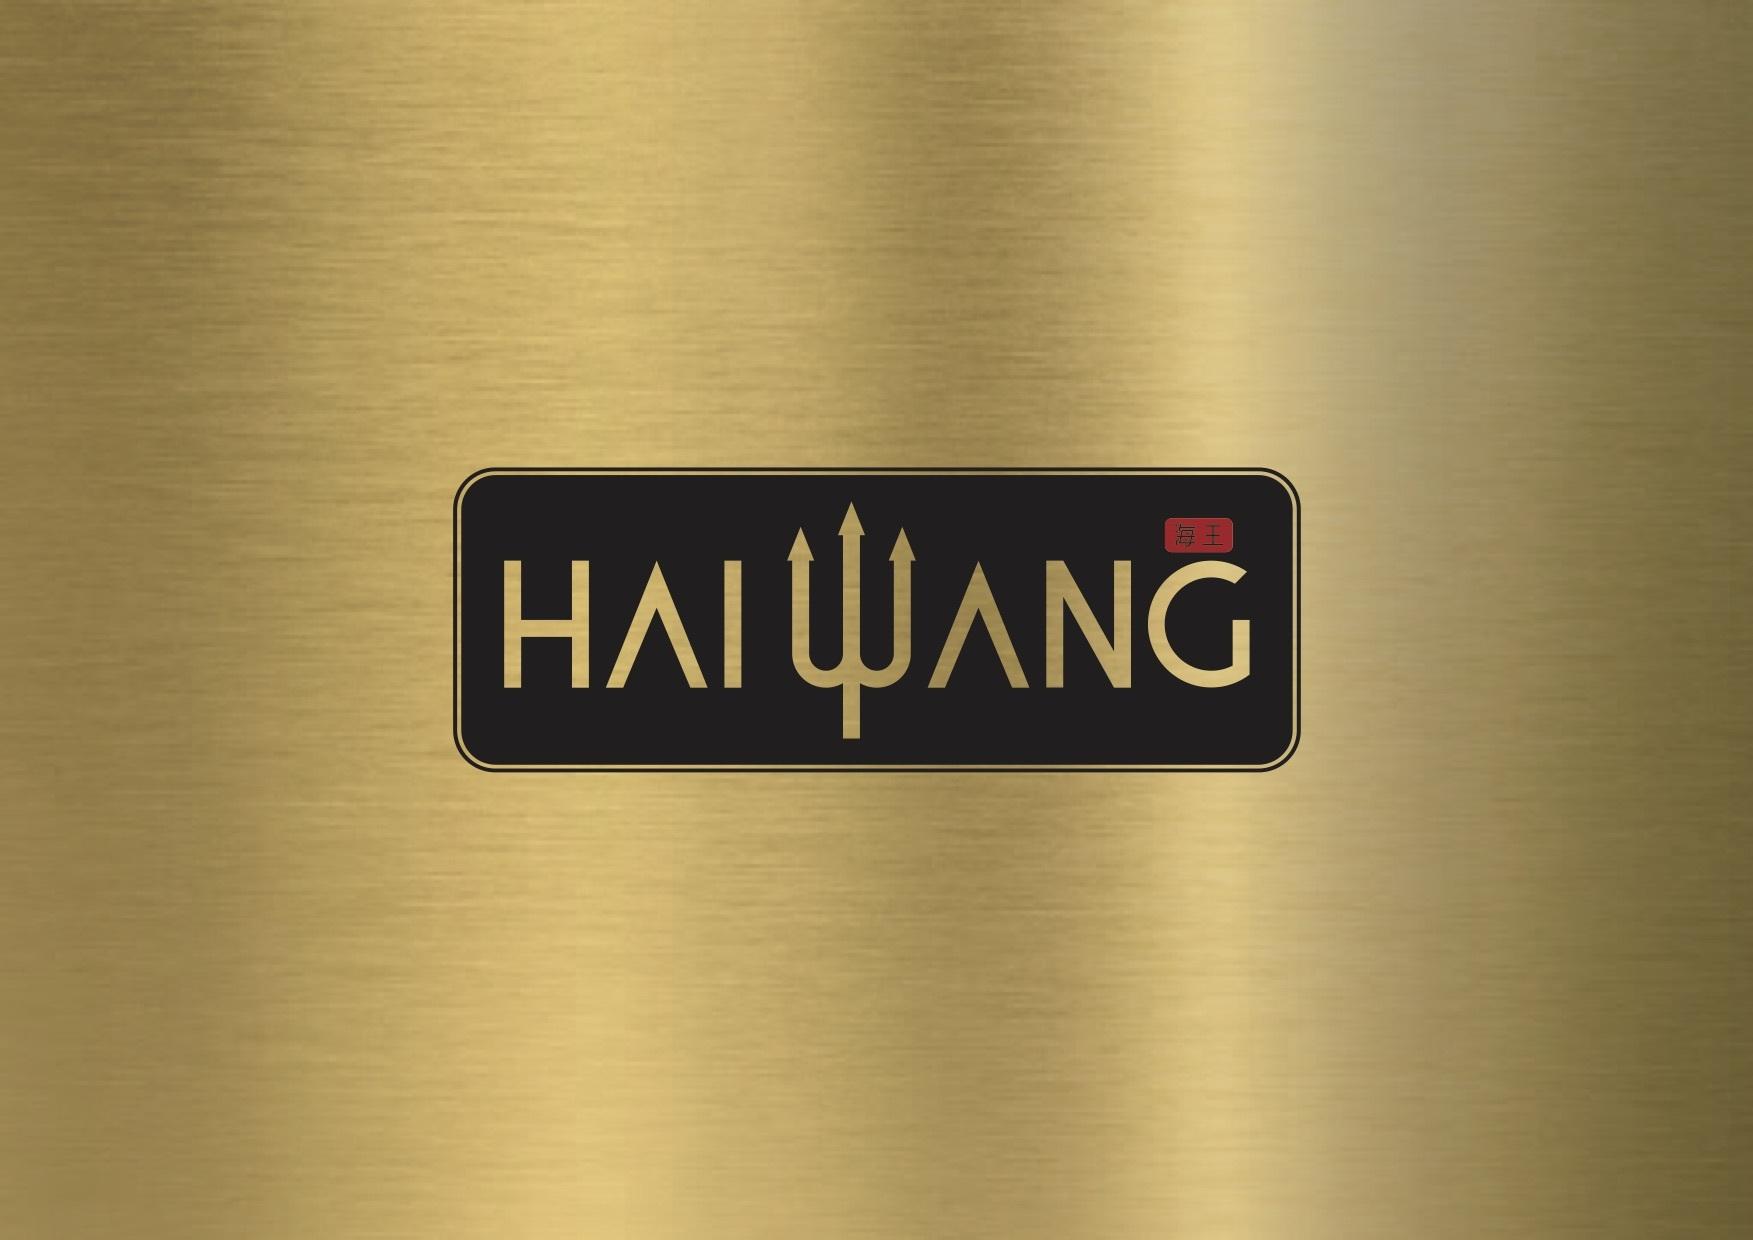 Hai Wang Seafood